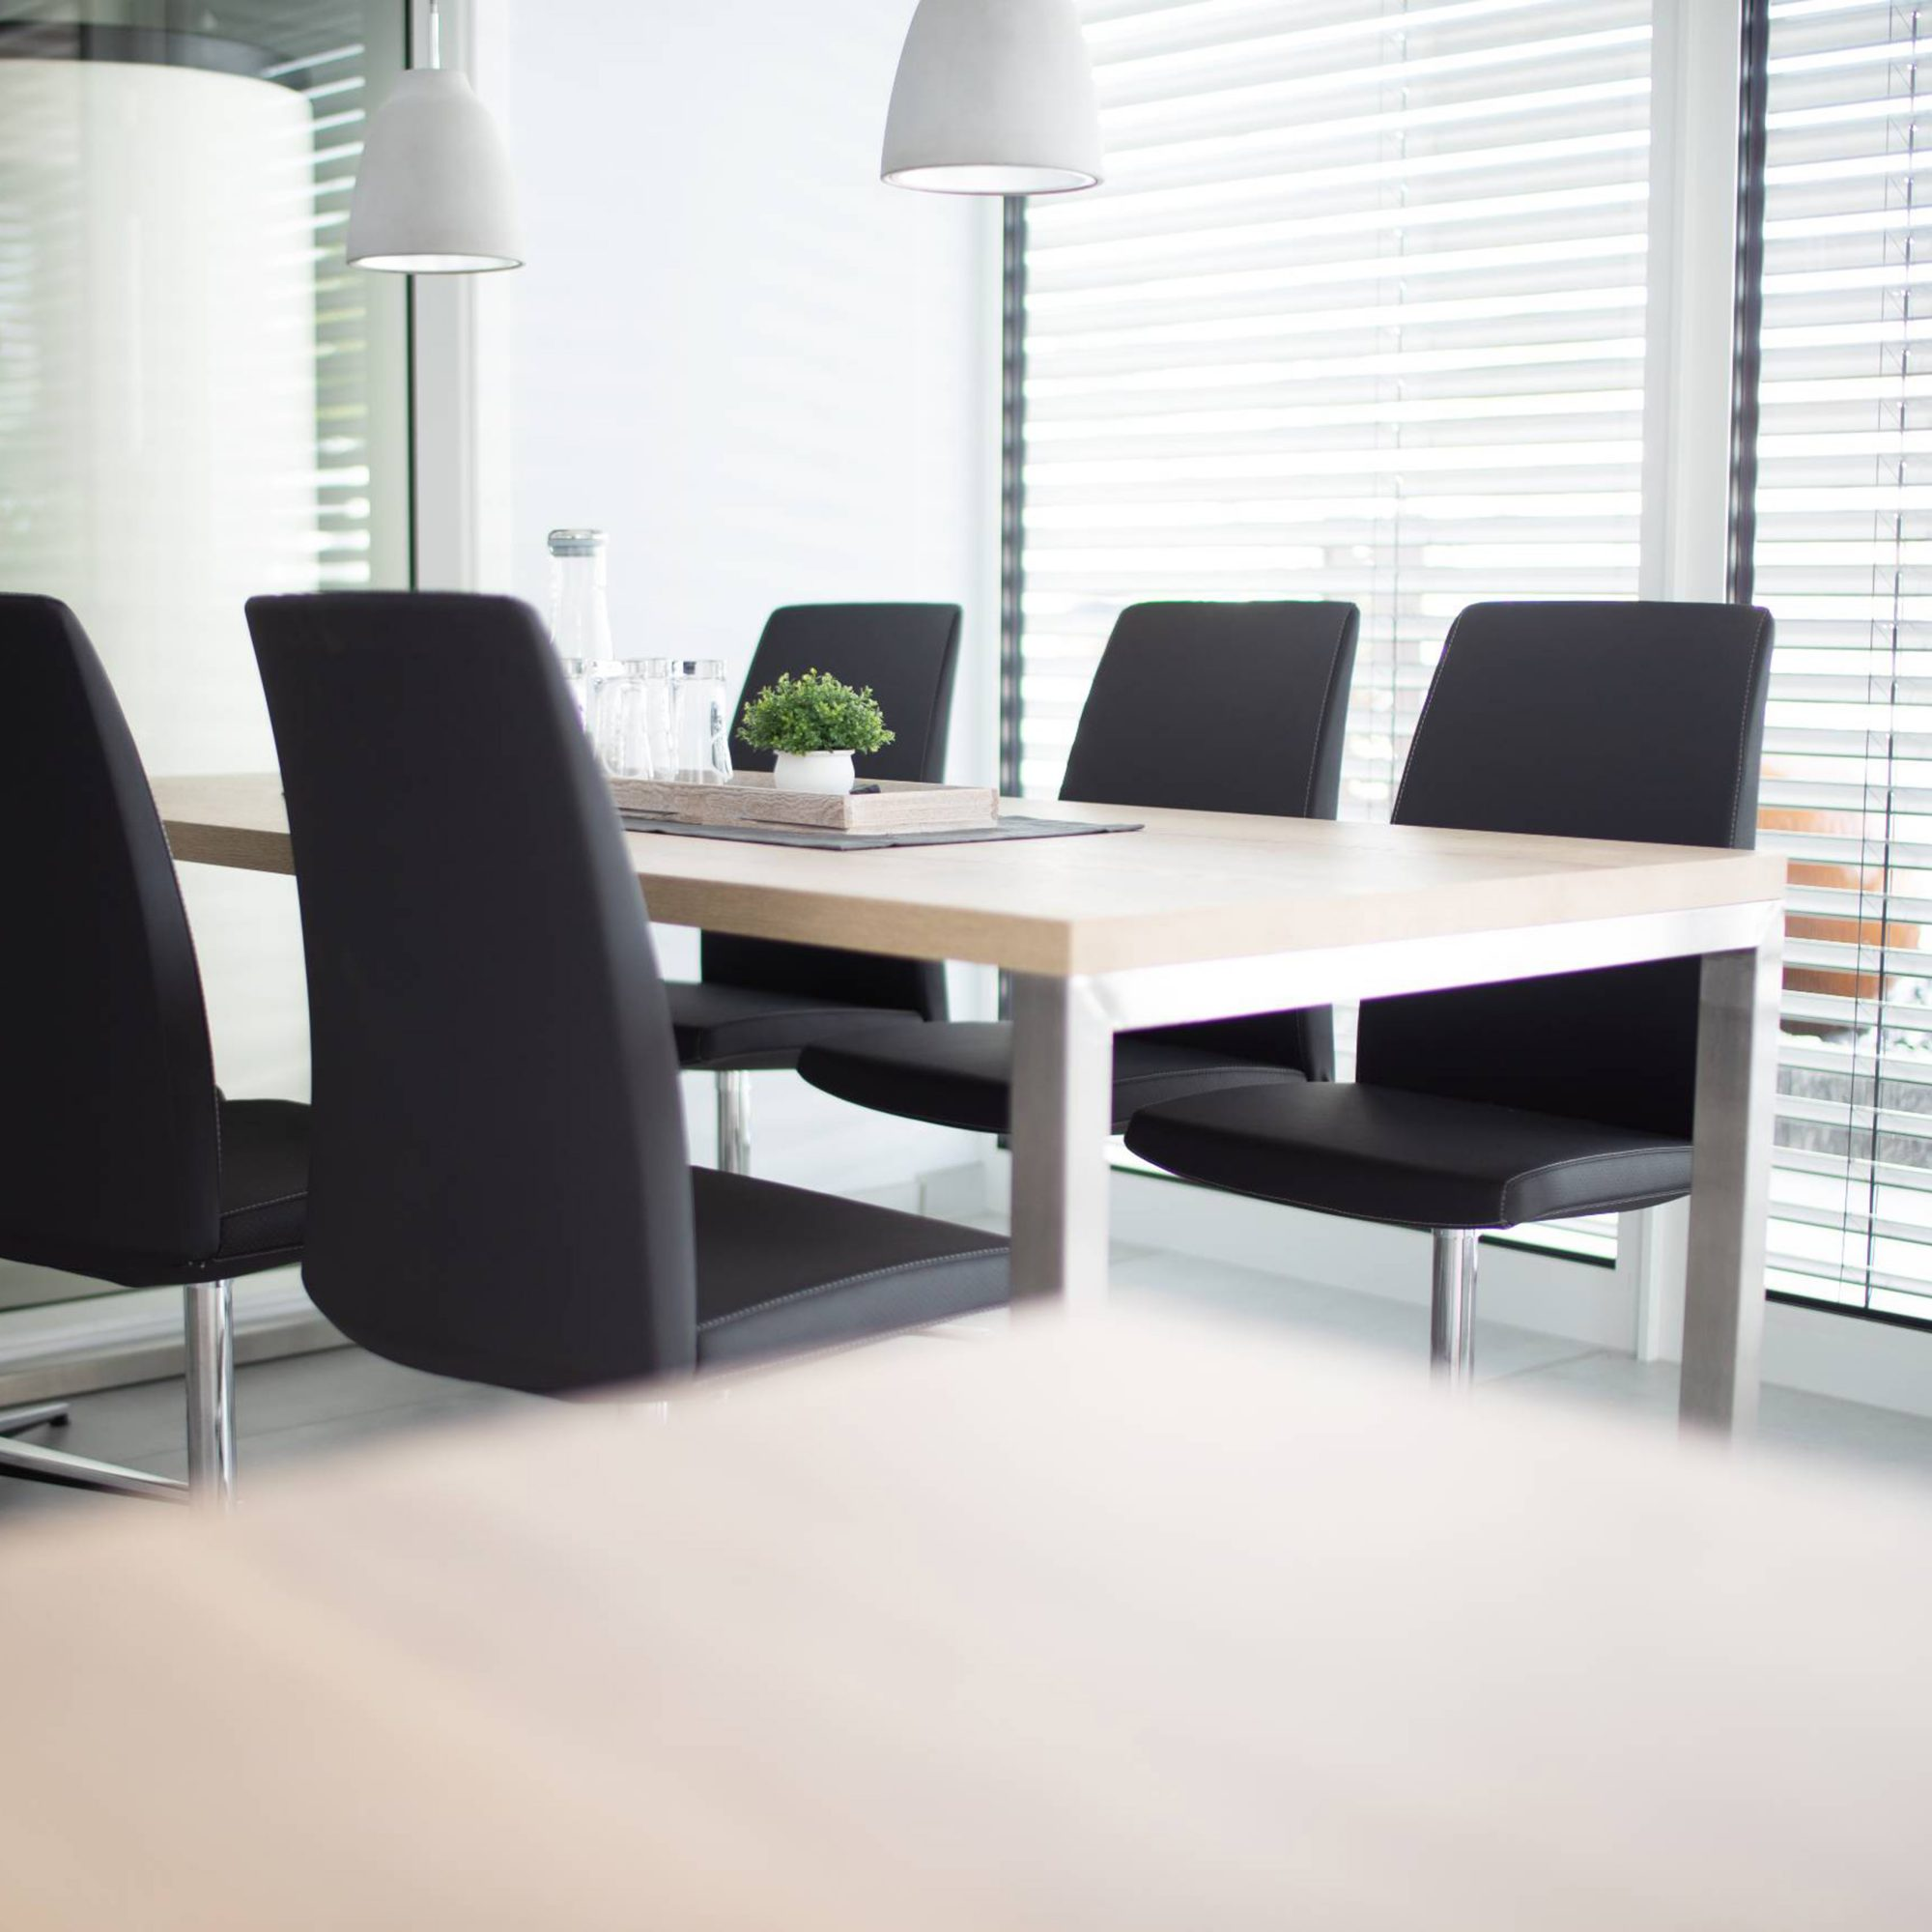 moebel-for-you.de Büroeinrichtung Konferenztisch